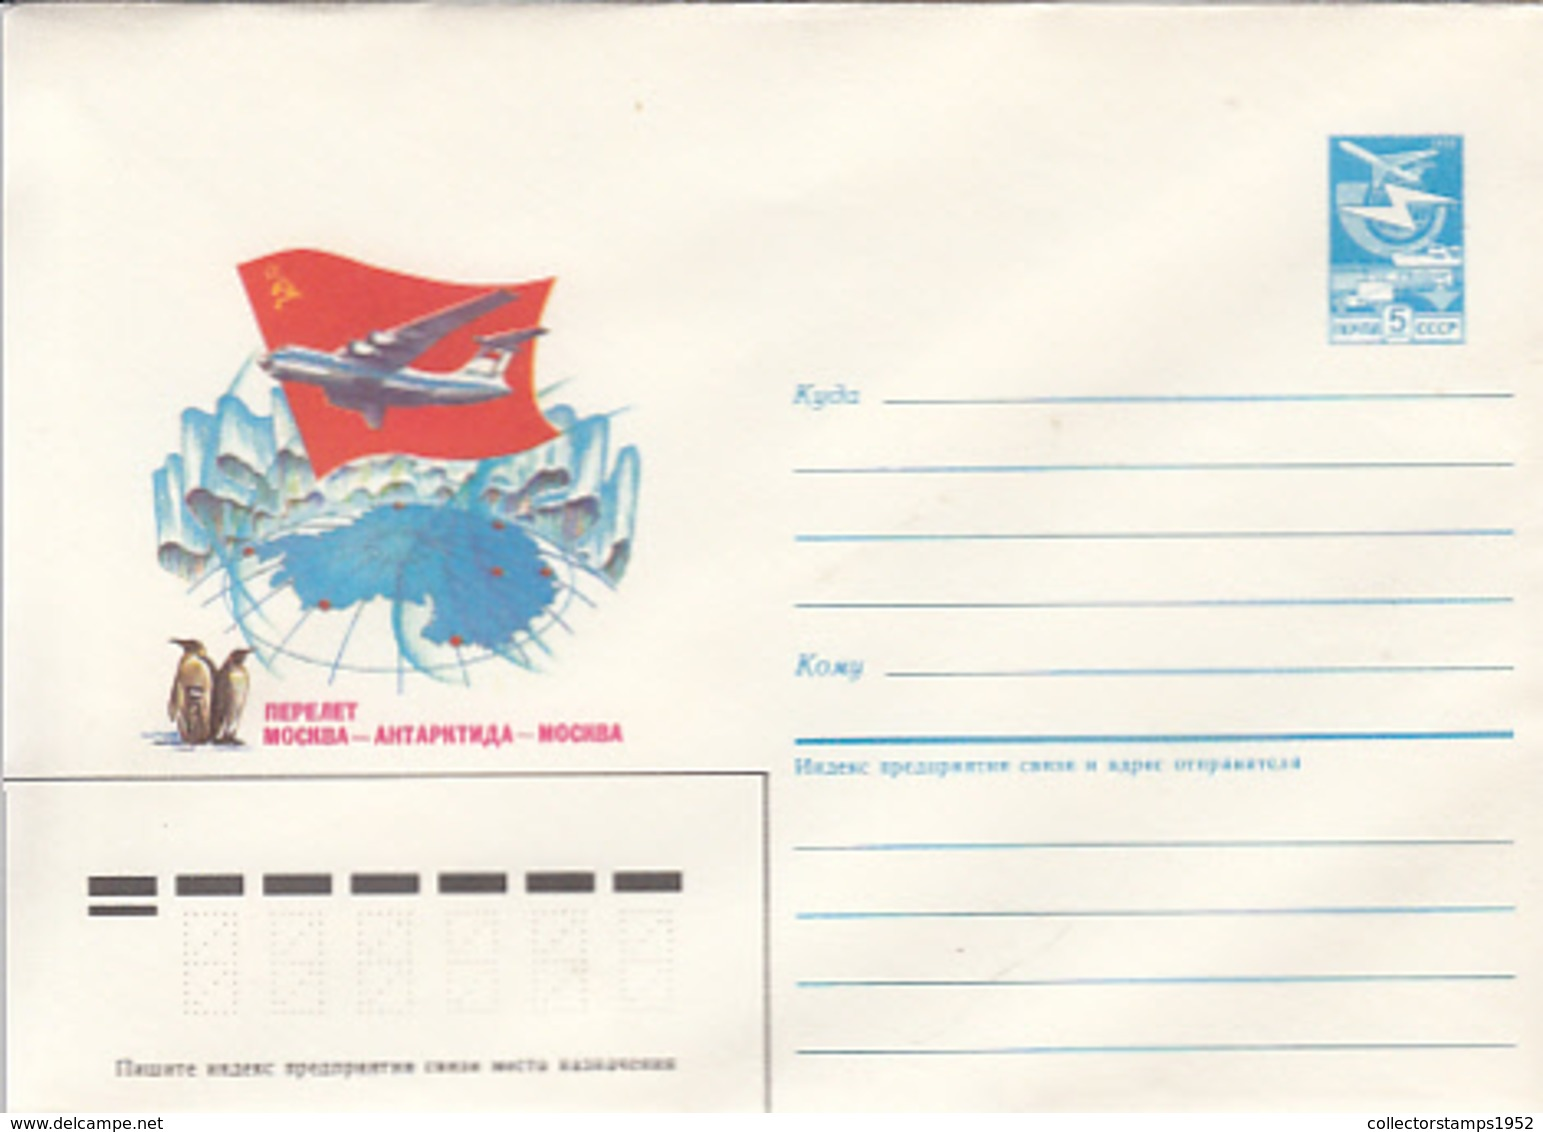 76398- MOSCOW-ANTARCTICA-MOSCOW FLIGHT, PLANE, PENGUINS, POLAR FLIGHTS, COVER STATIONERY, 1986, RUSSIA-USSR - Polar Flights